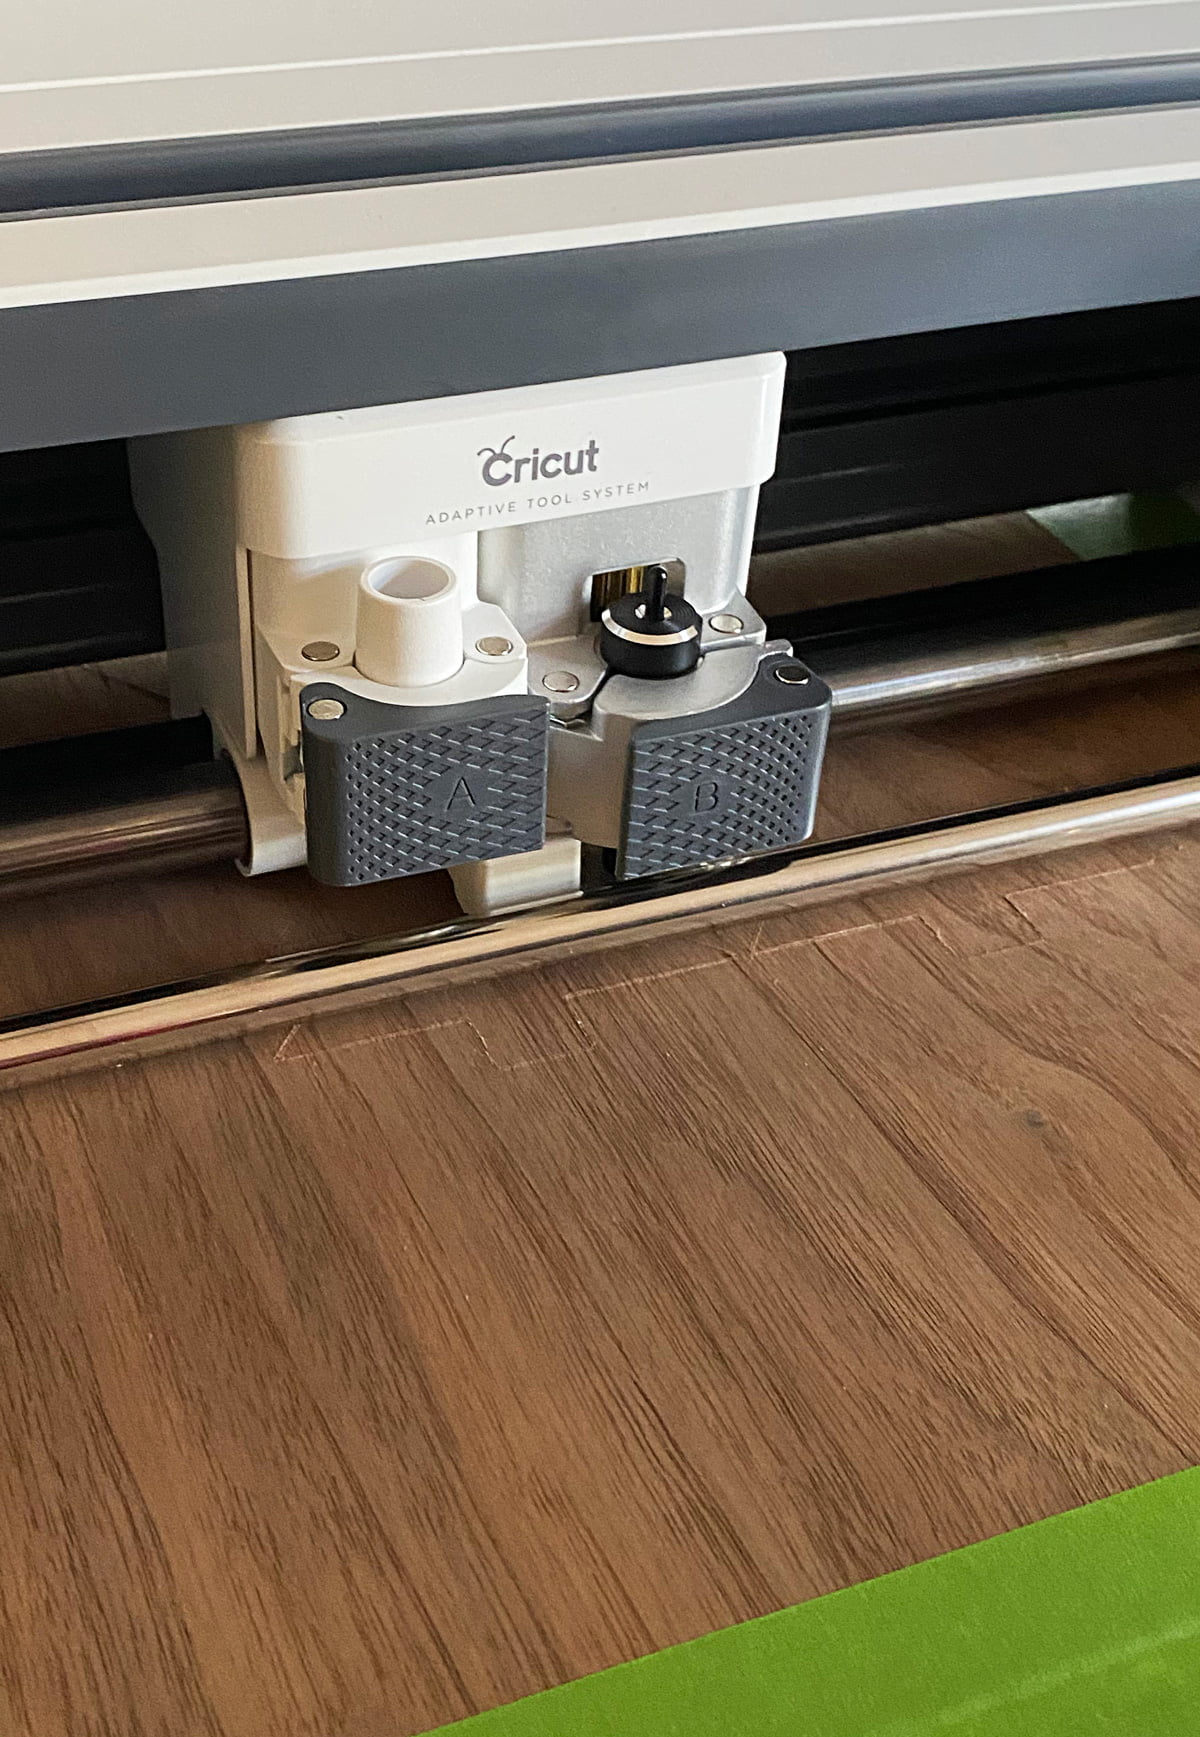 How to cut veneer with cricut